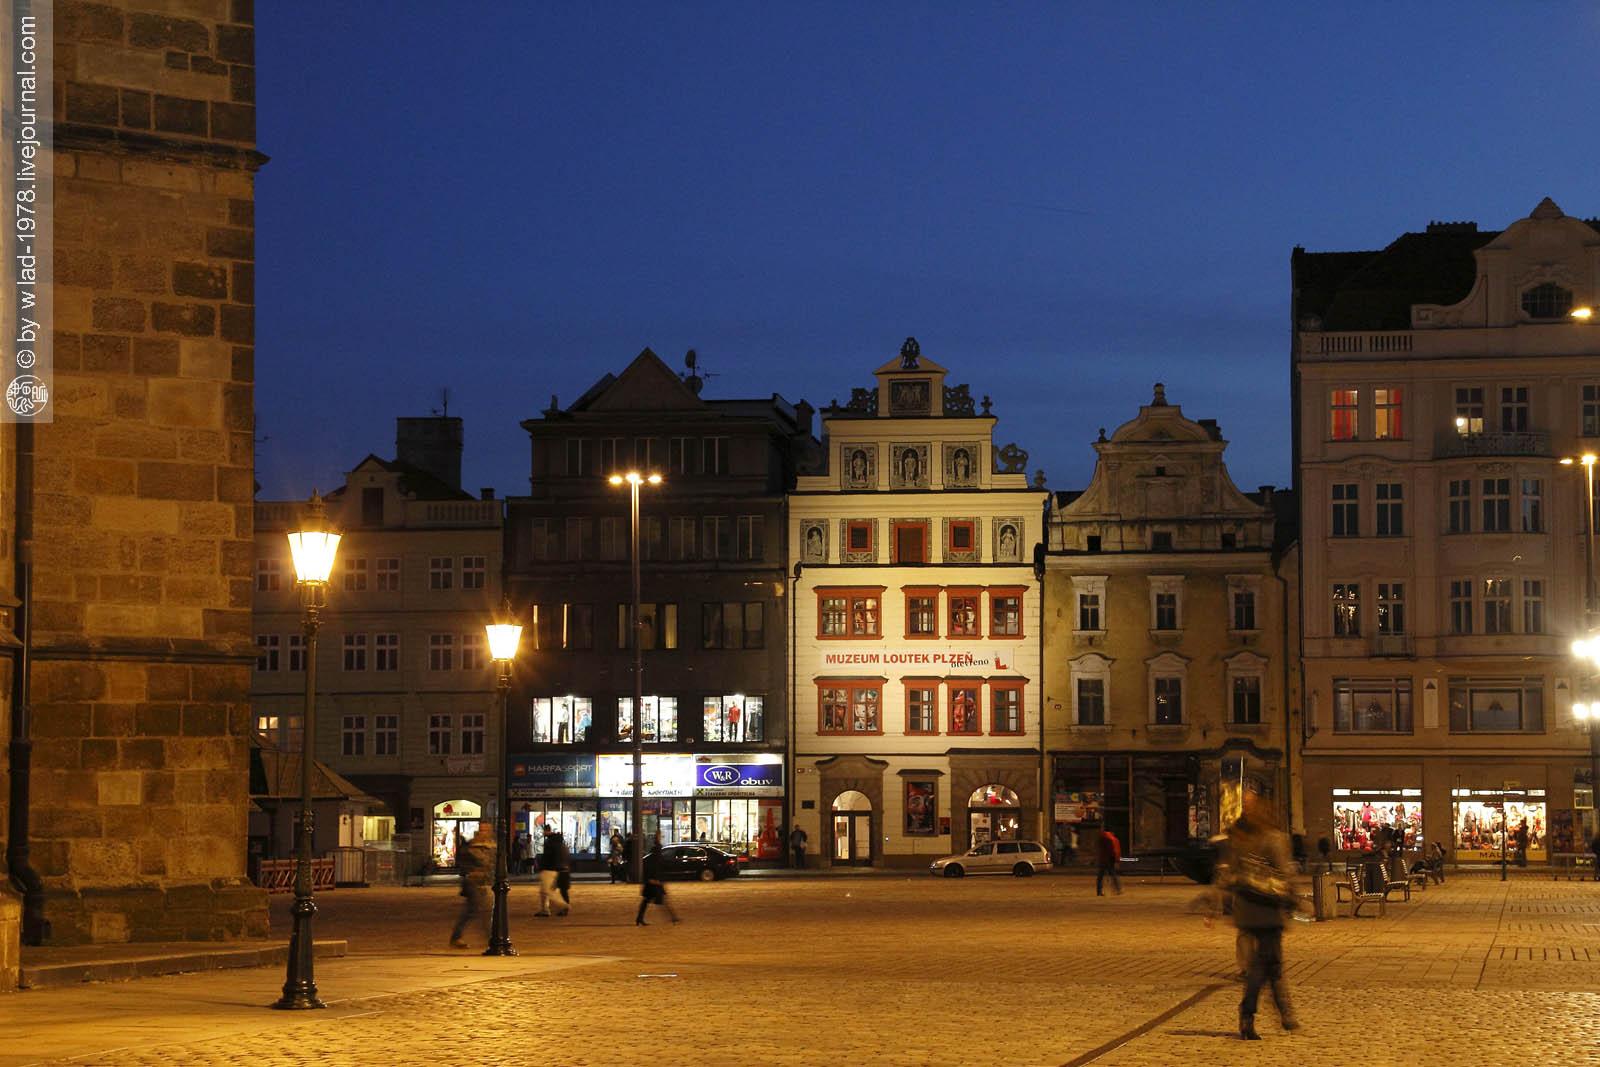 Площадь Республики, Плзень